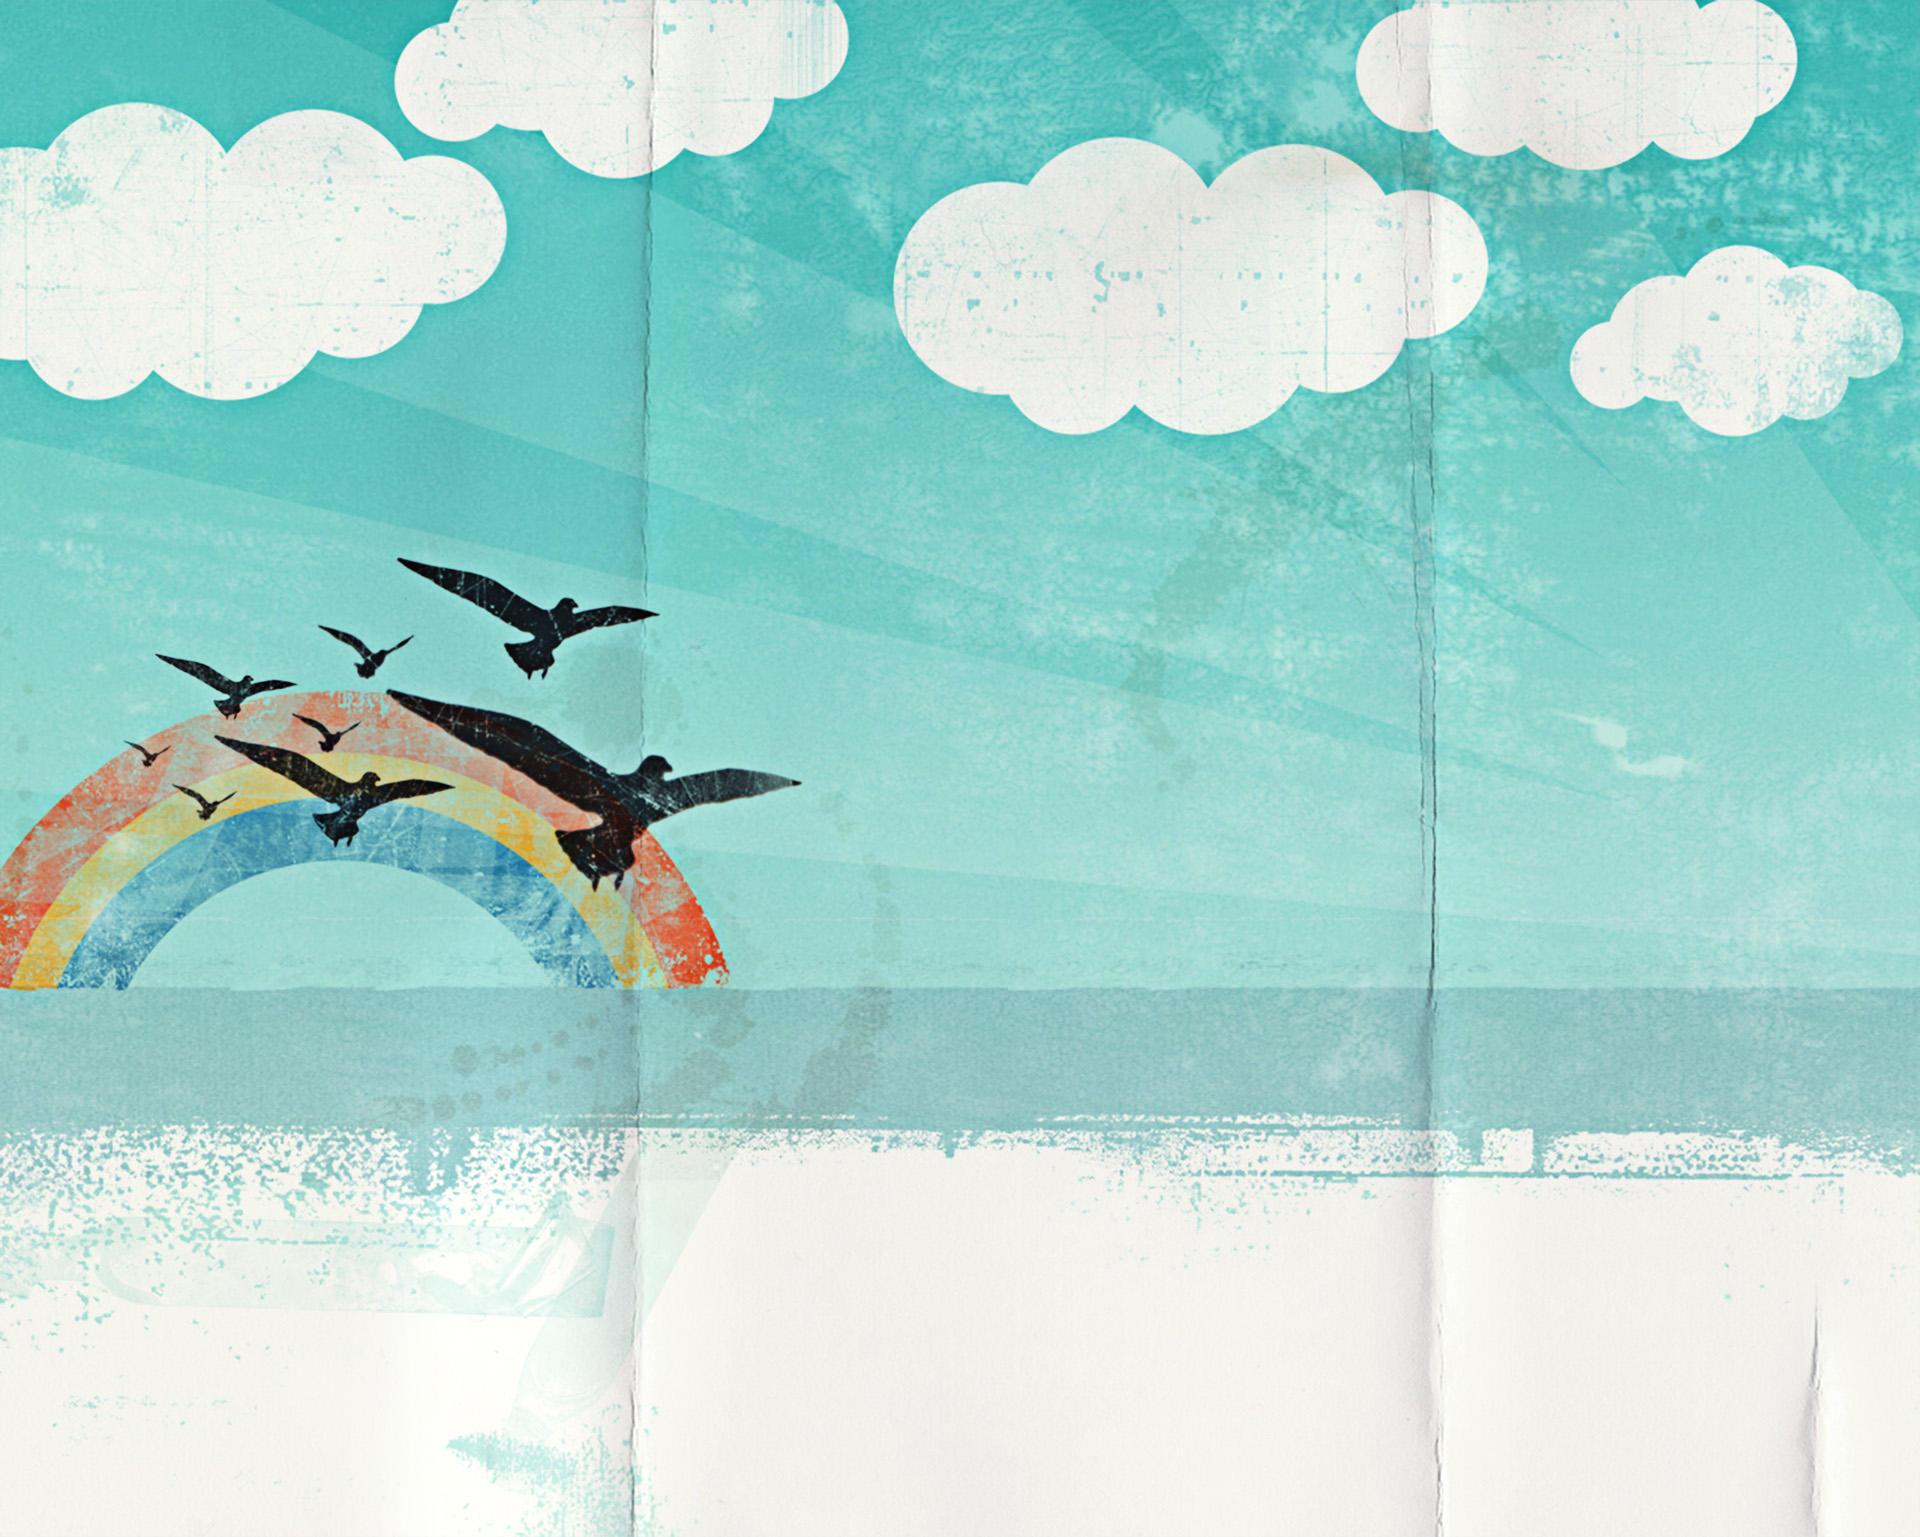 Birds by mwmax